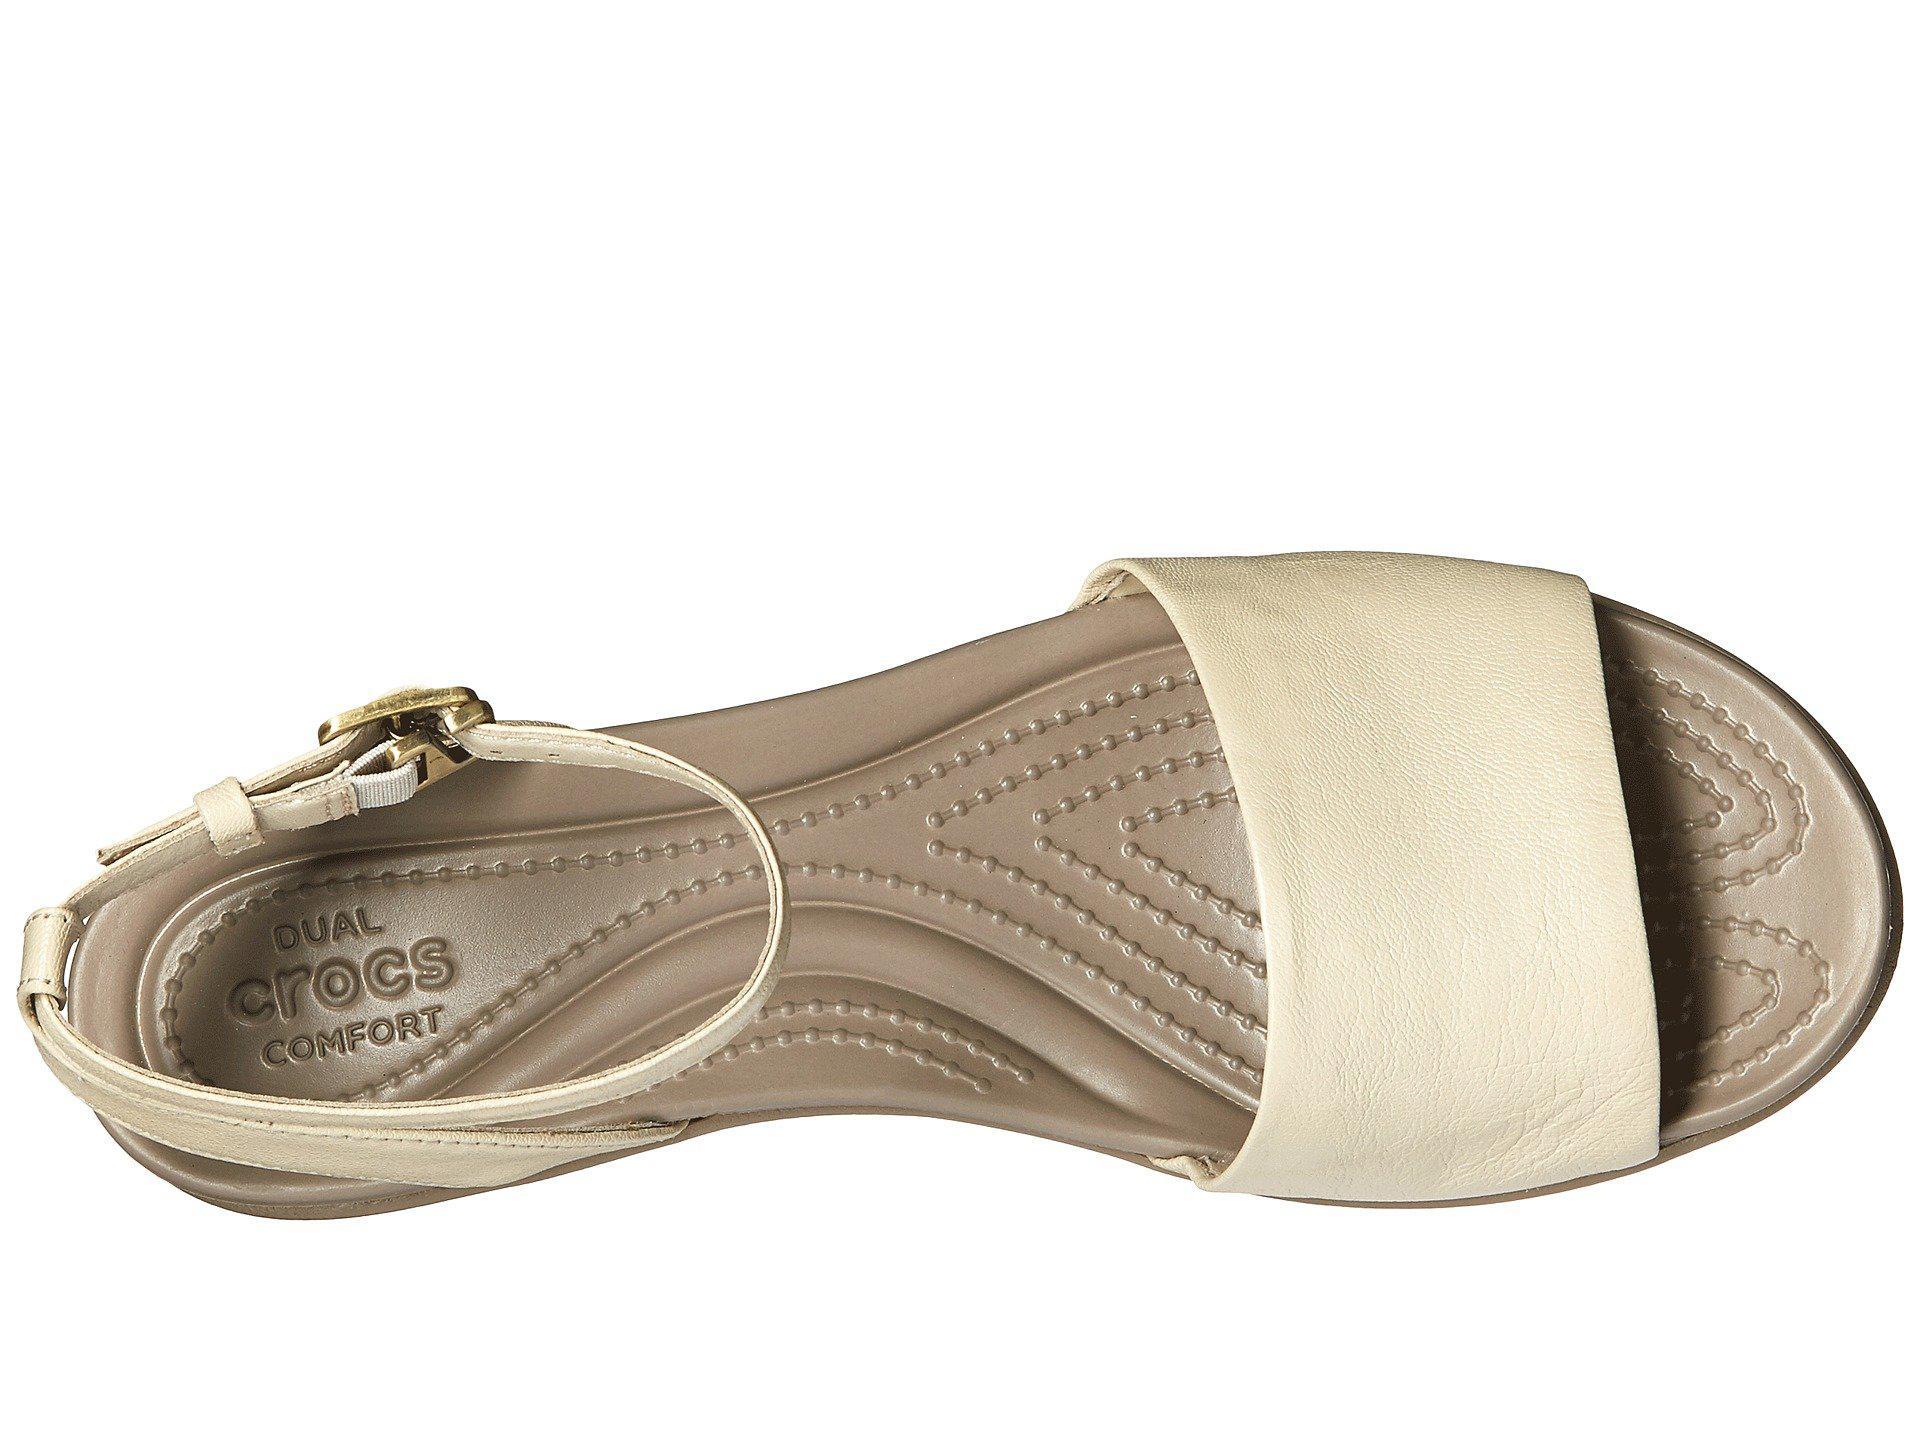 c37b09de7328 Crocs™ - Multicolor Leigh-ann Ankle Strap Leather - Lyst. View fullscreen